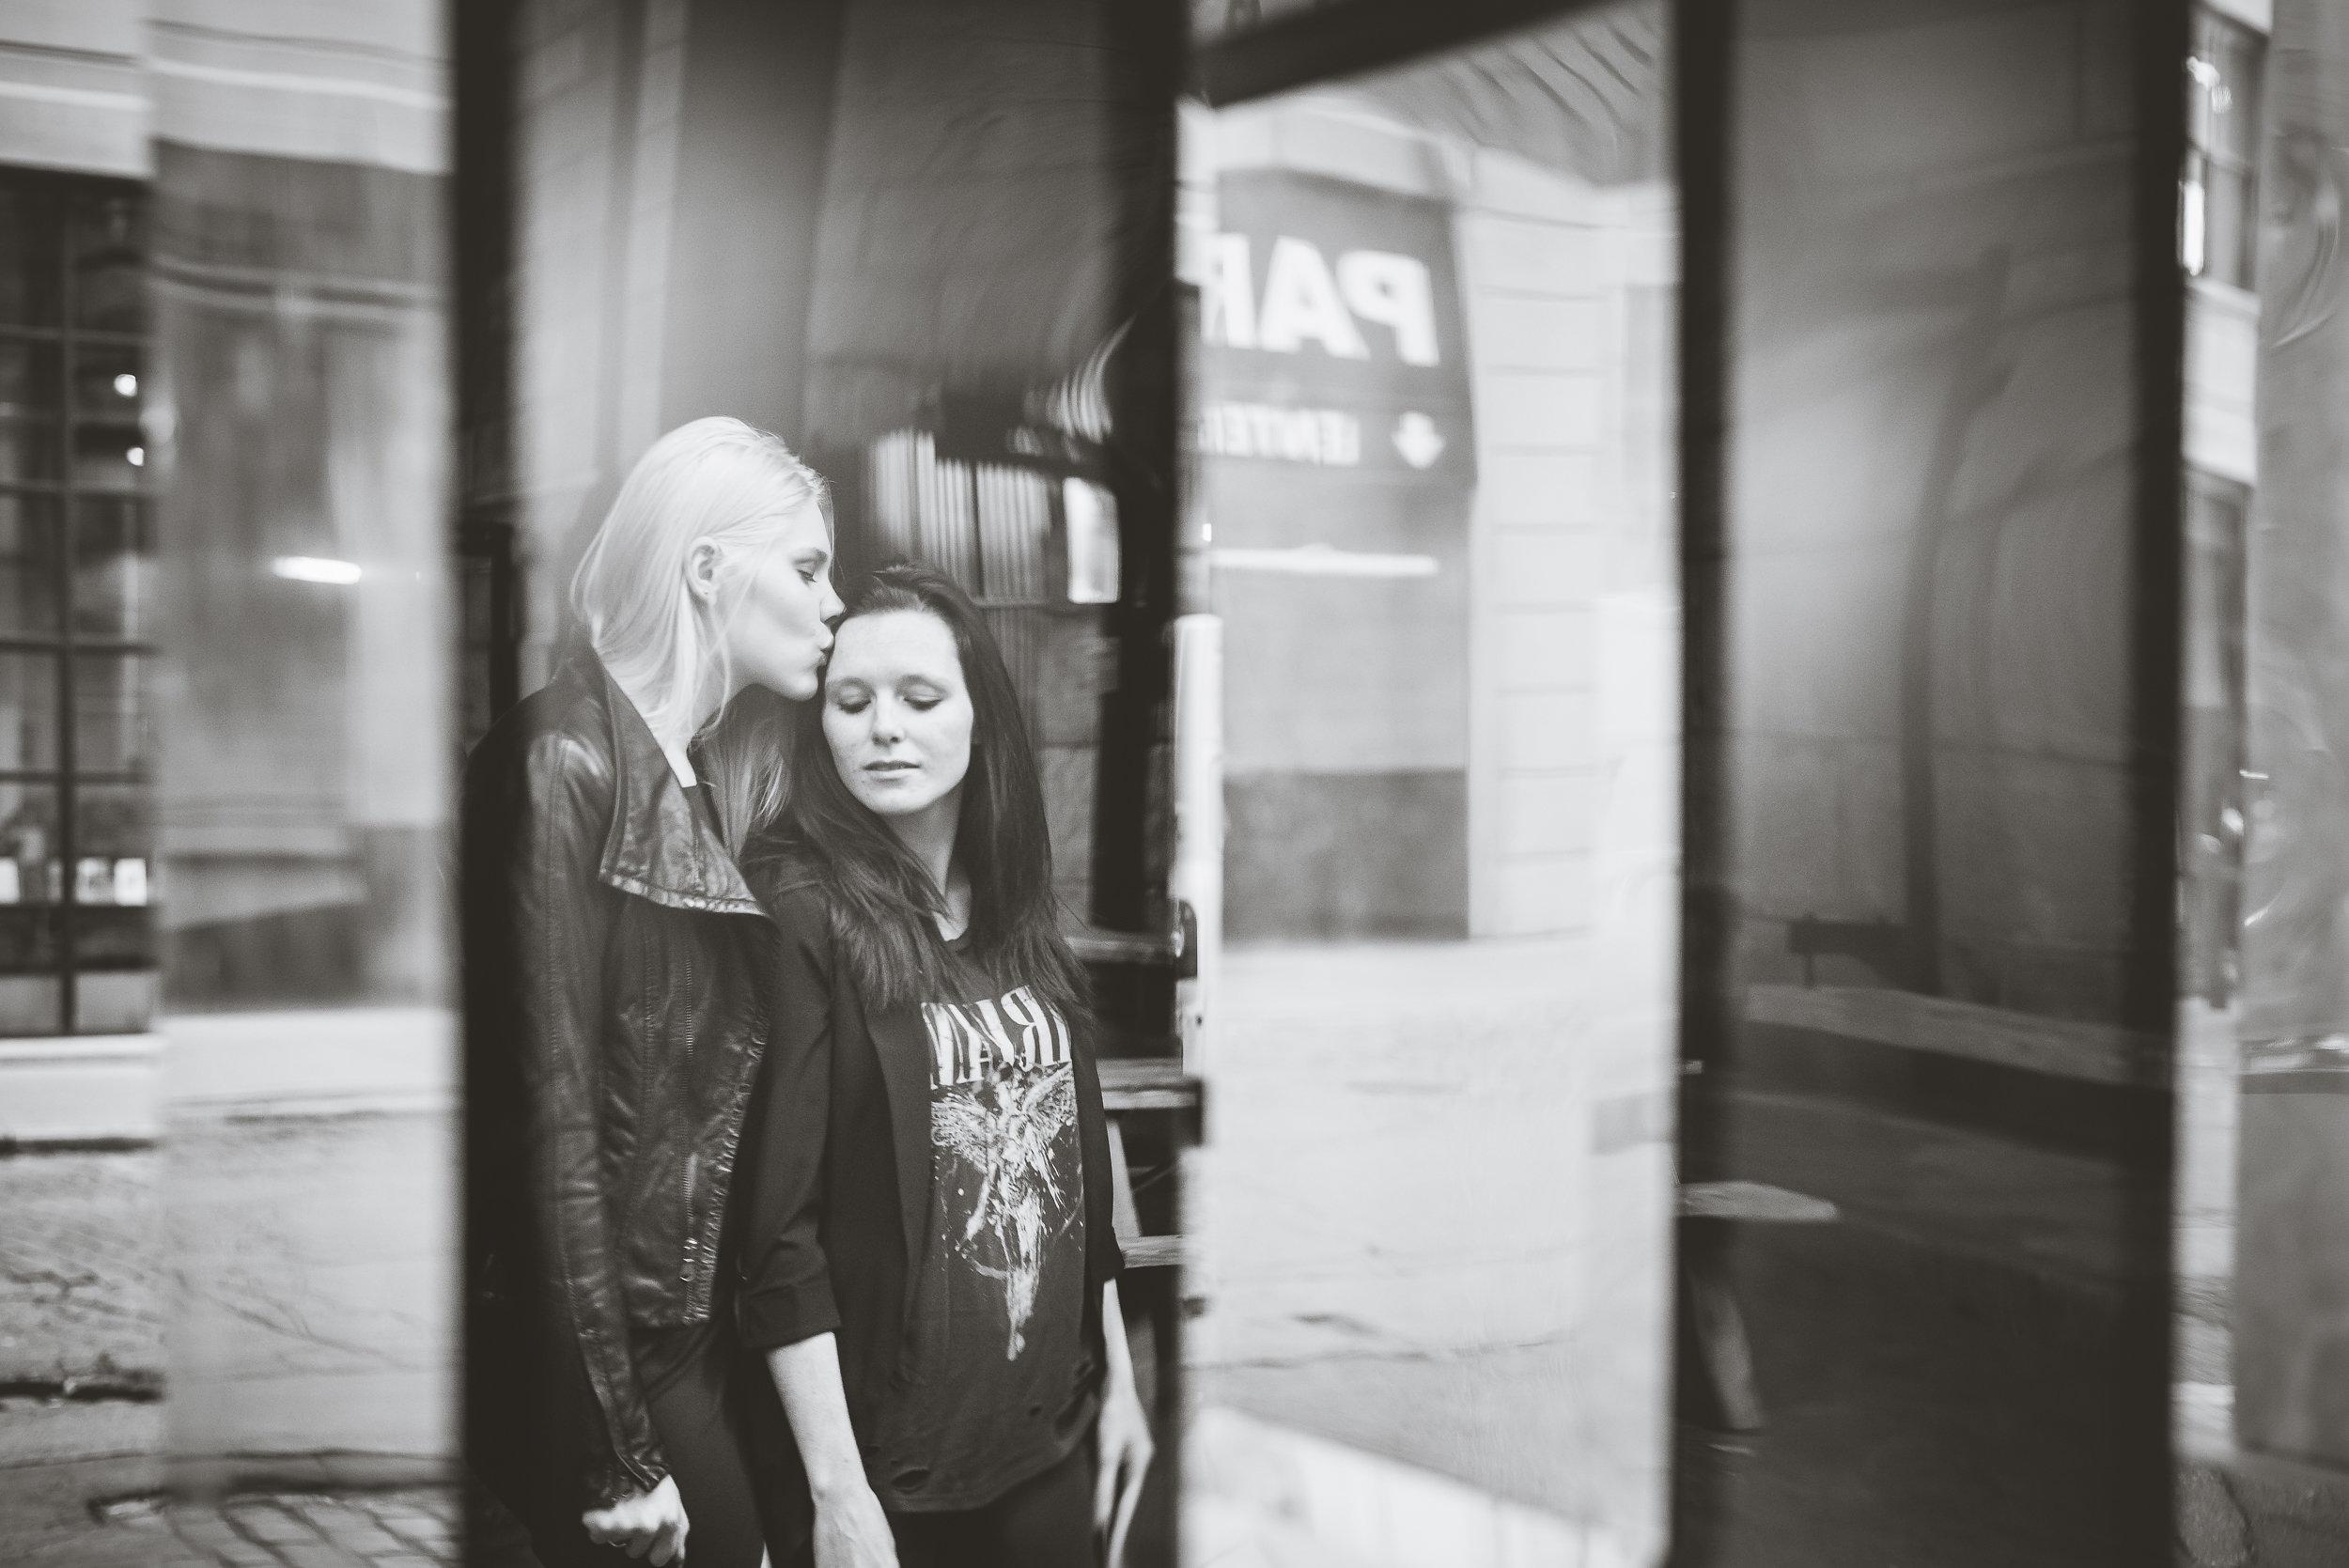 Alexa&Emily Dumbo NYC Couples Session (19).JPG